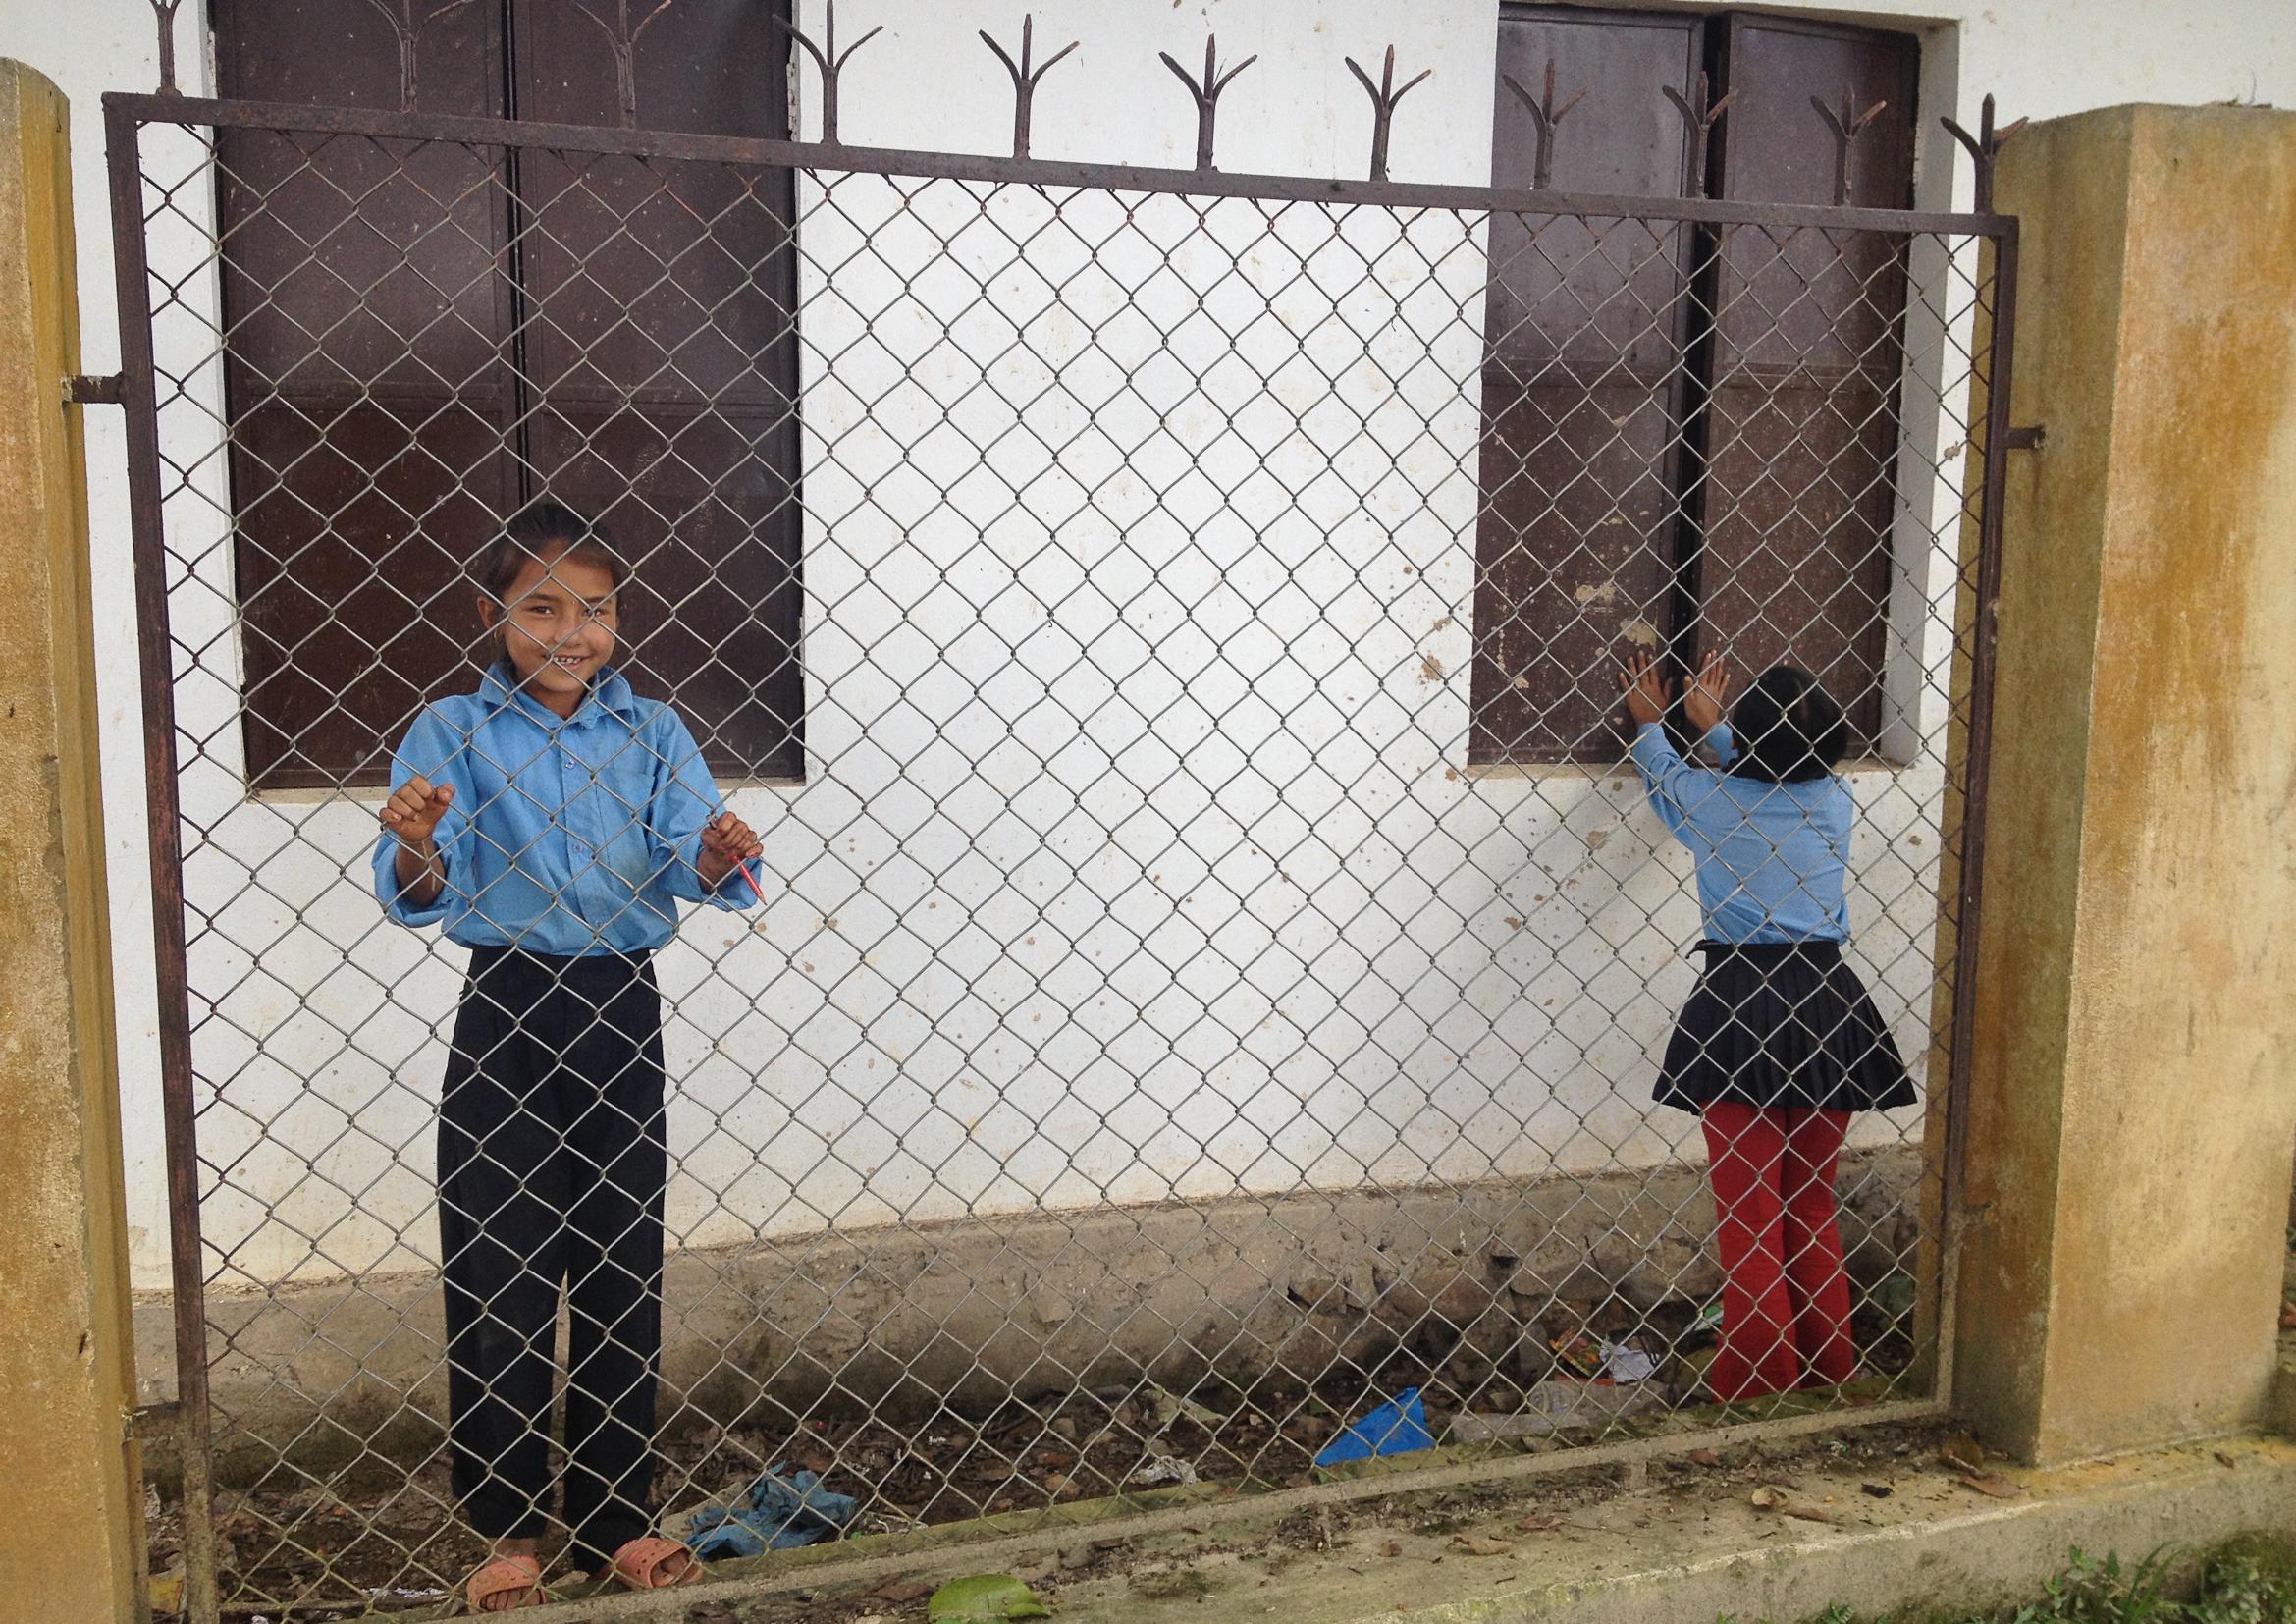 nepal school education fence boy girl